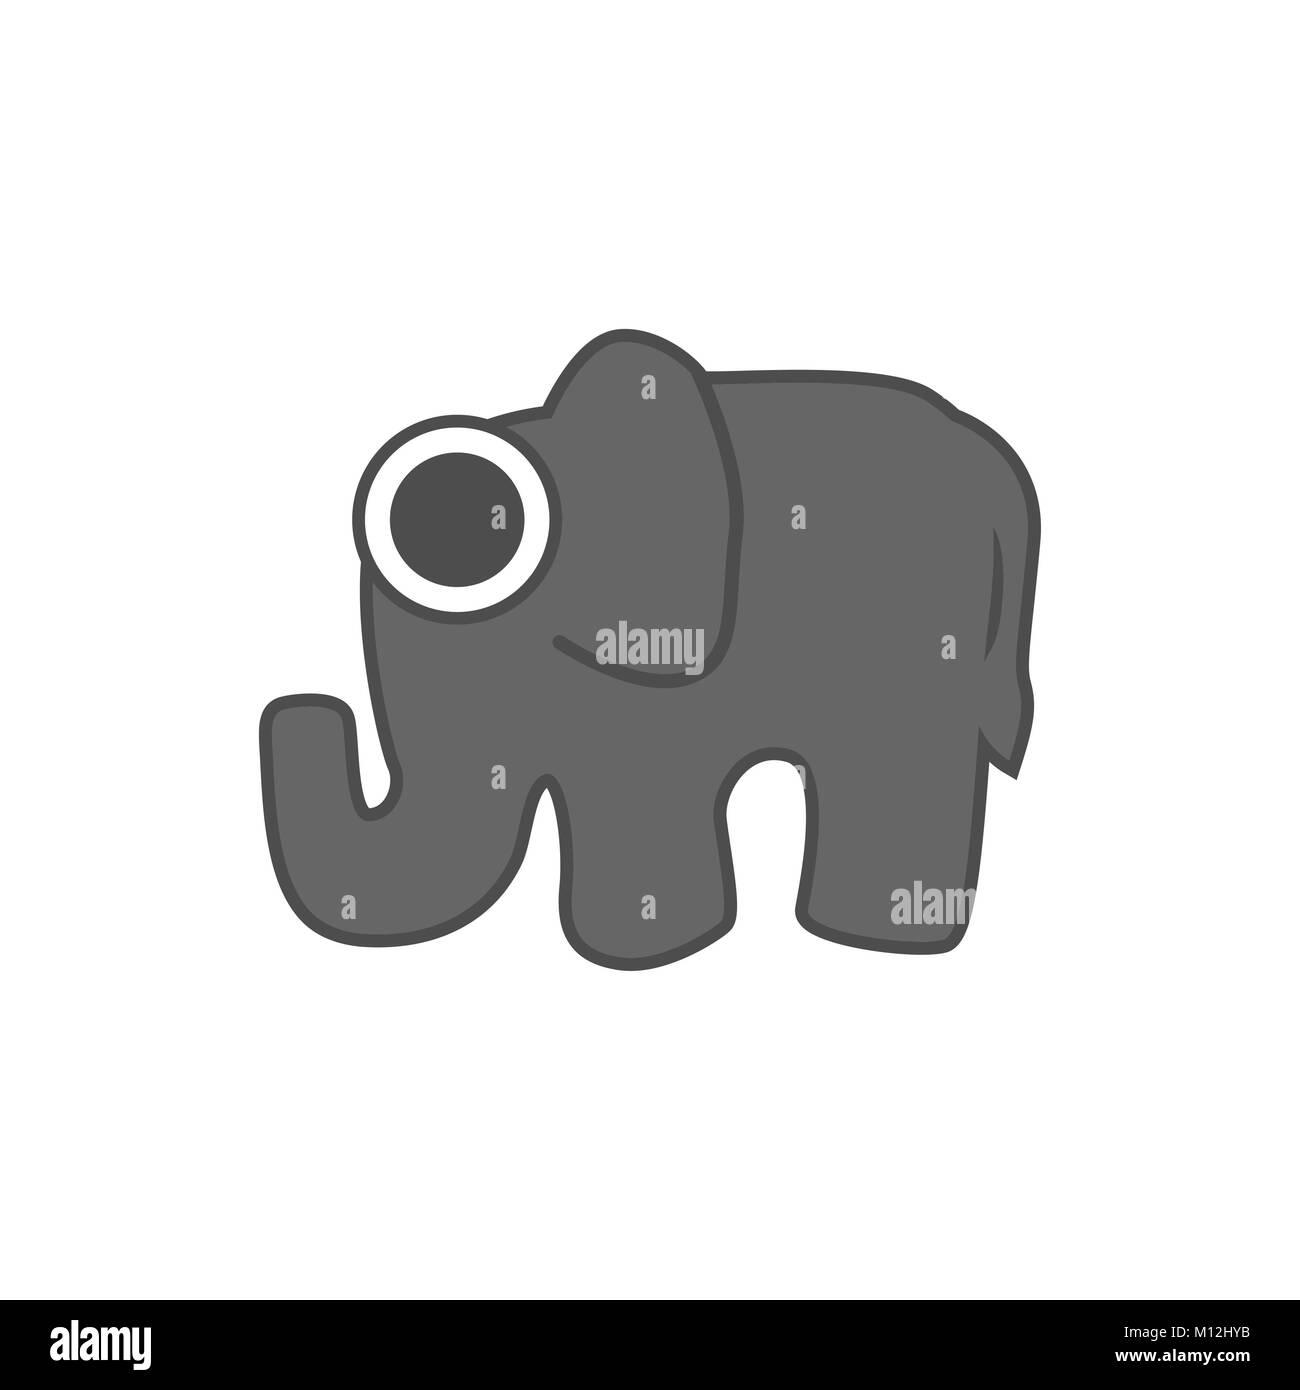 Elephant Vector Stock Photos & Elephant Vector Stock Images - Alamy